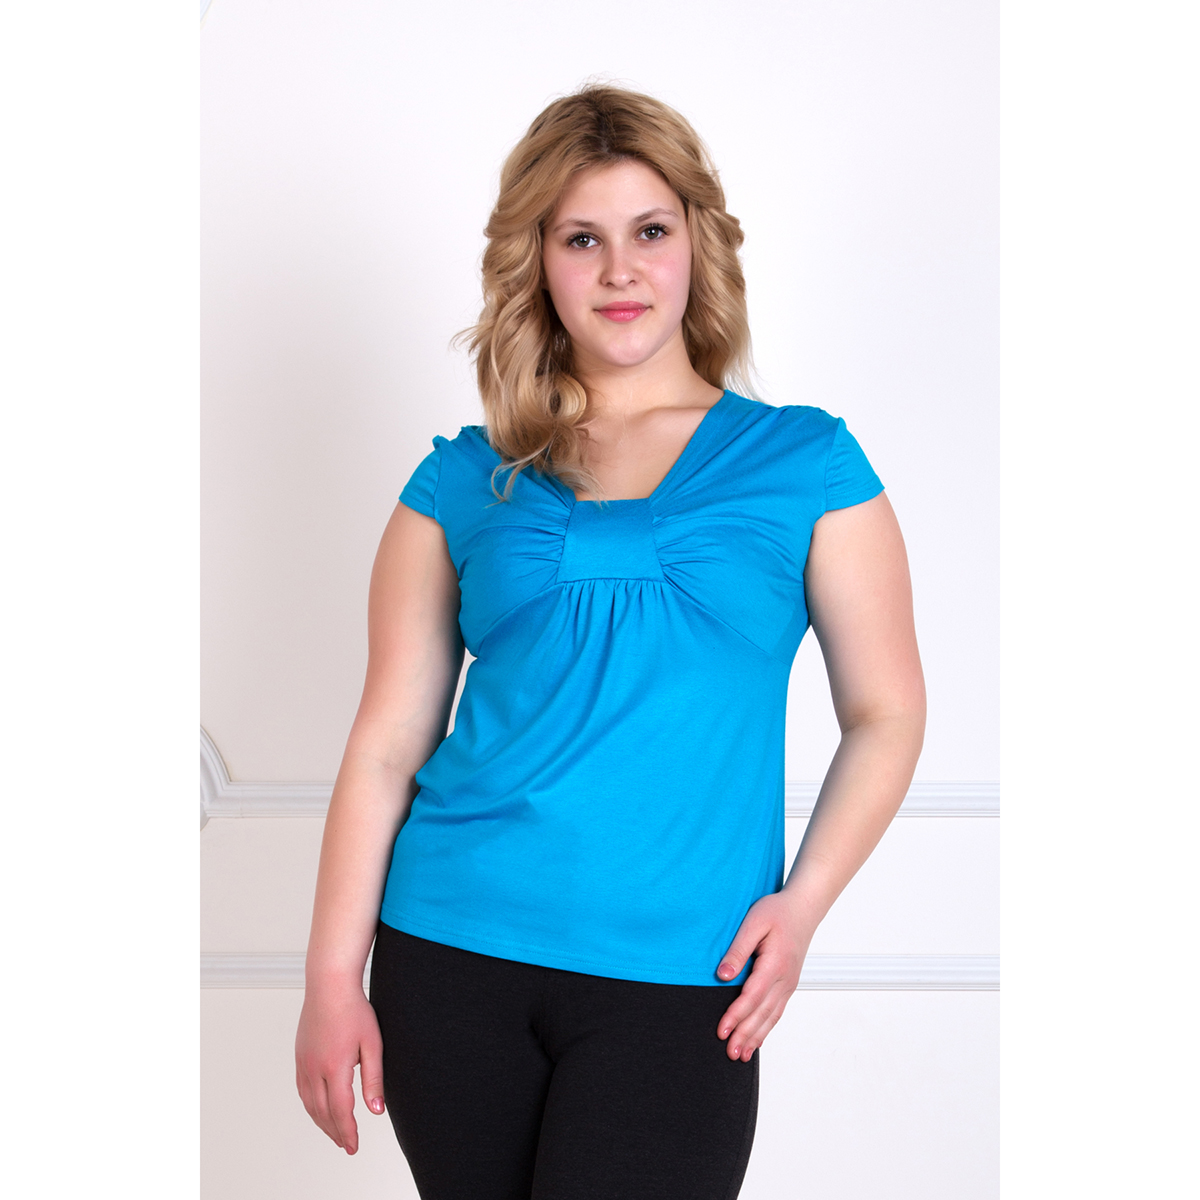 Женская блуза Романтика Голубой, размер 44Блузы<br>Обхват груди:88 см<br>Обхват талии:68 см<br>Обхват бедер:96 см<br>Рост:167 см<br><br>Тип: Жен. блуза<br>Размер: 44<br>Материал: Вискоза